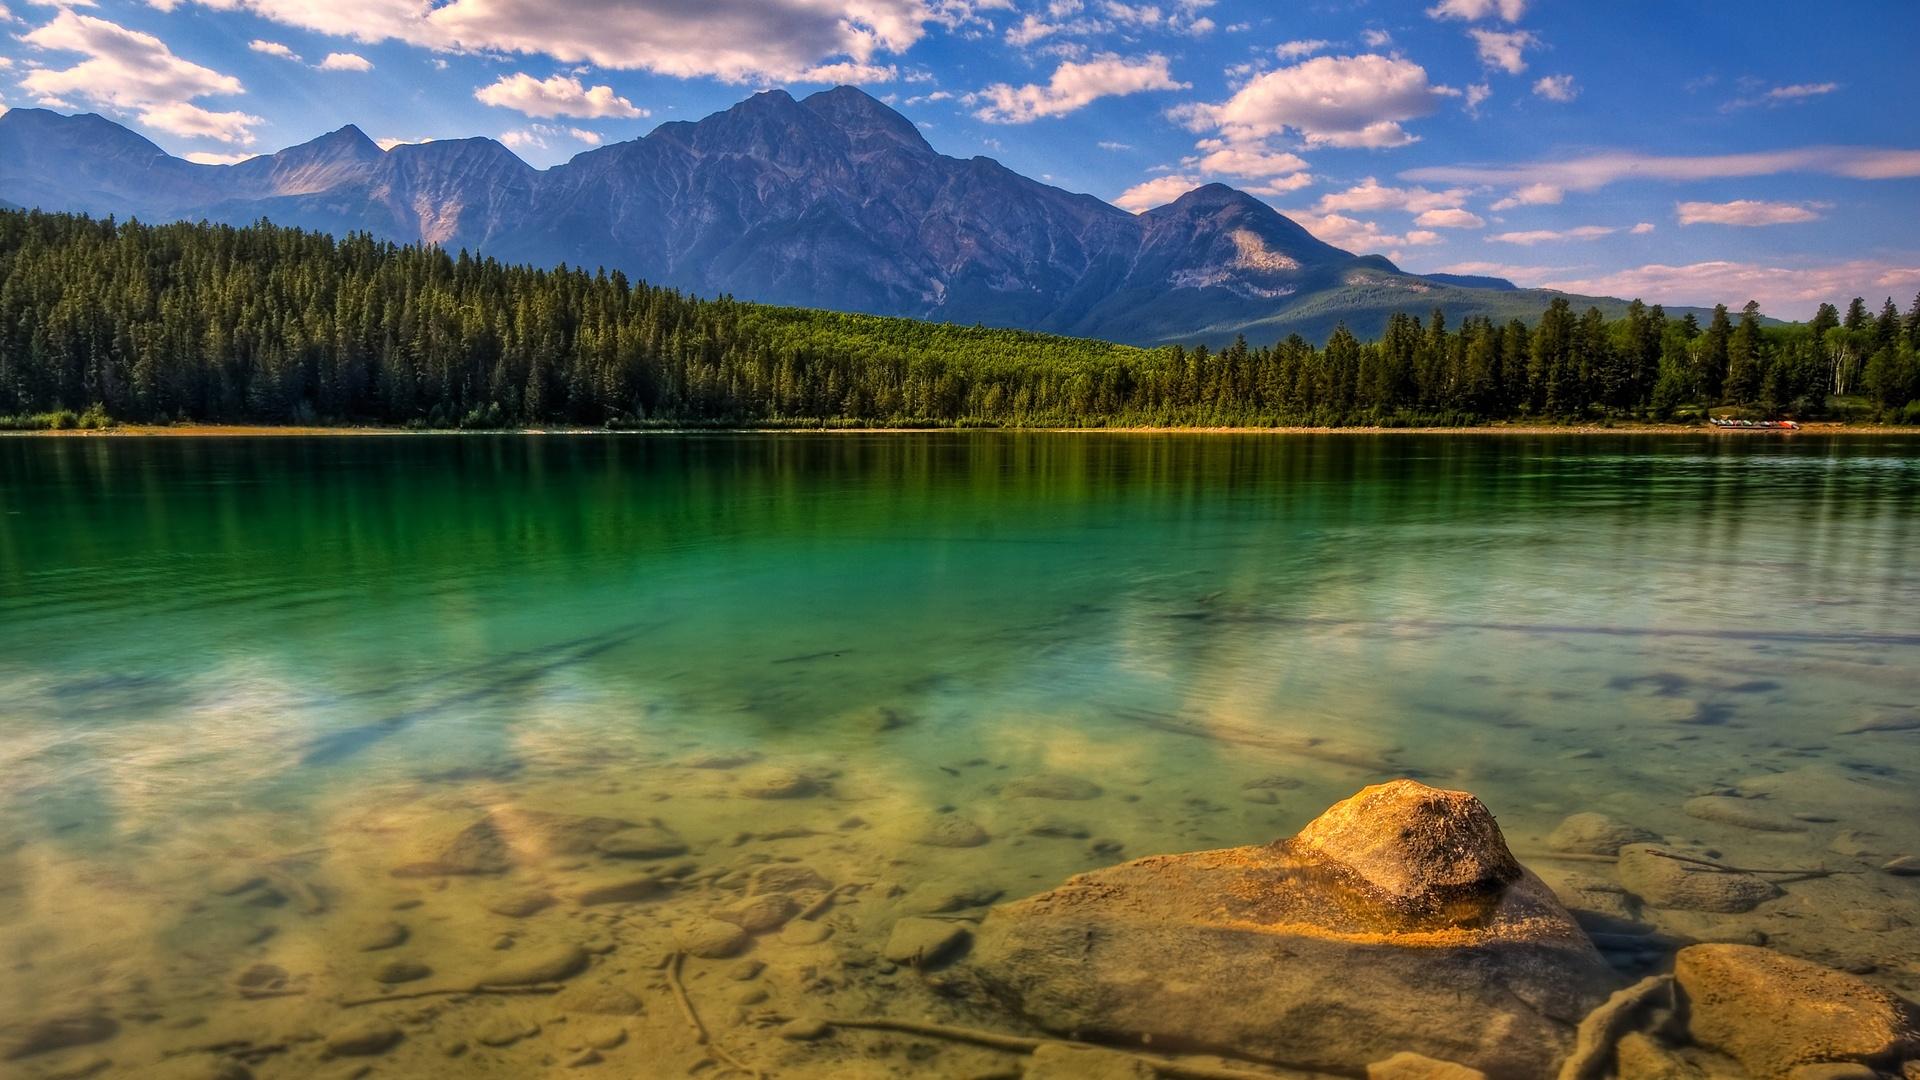 Alberta Canada Wallpapers   1920x1080   725561 1920x1080